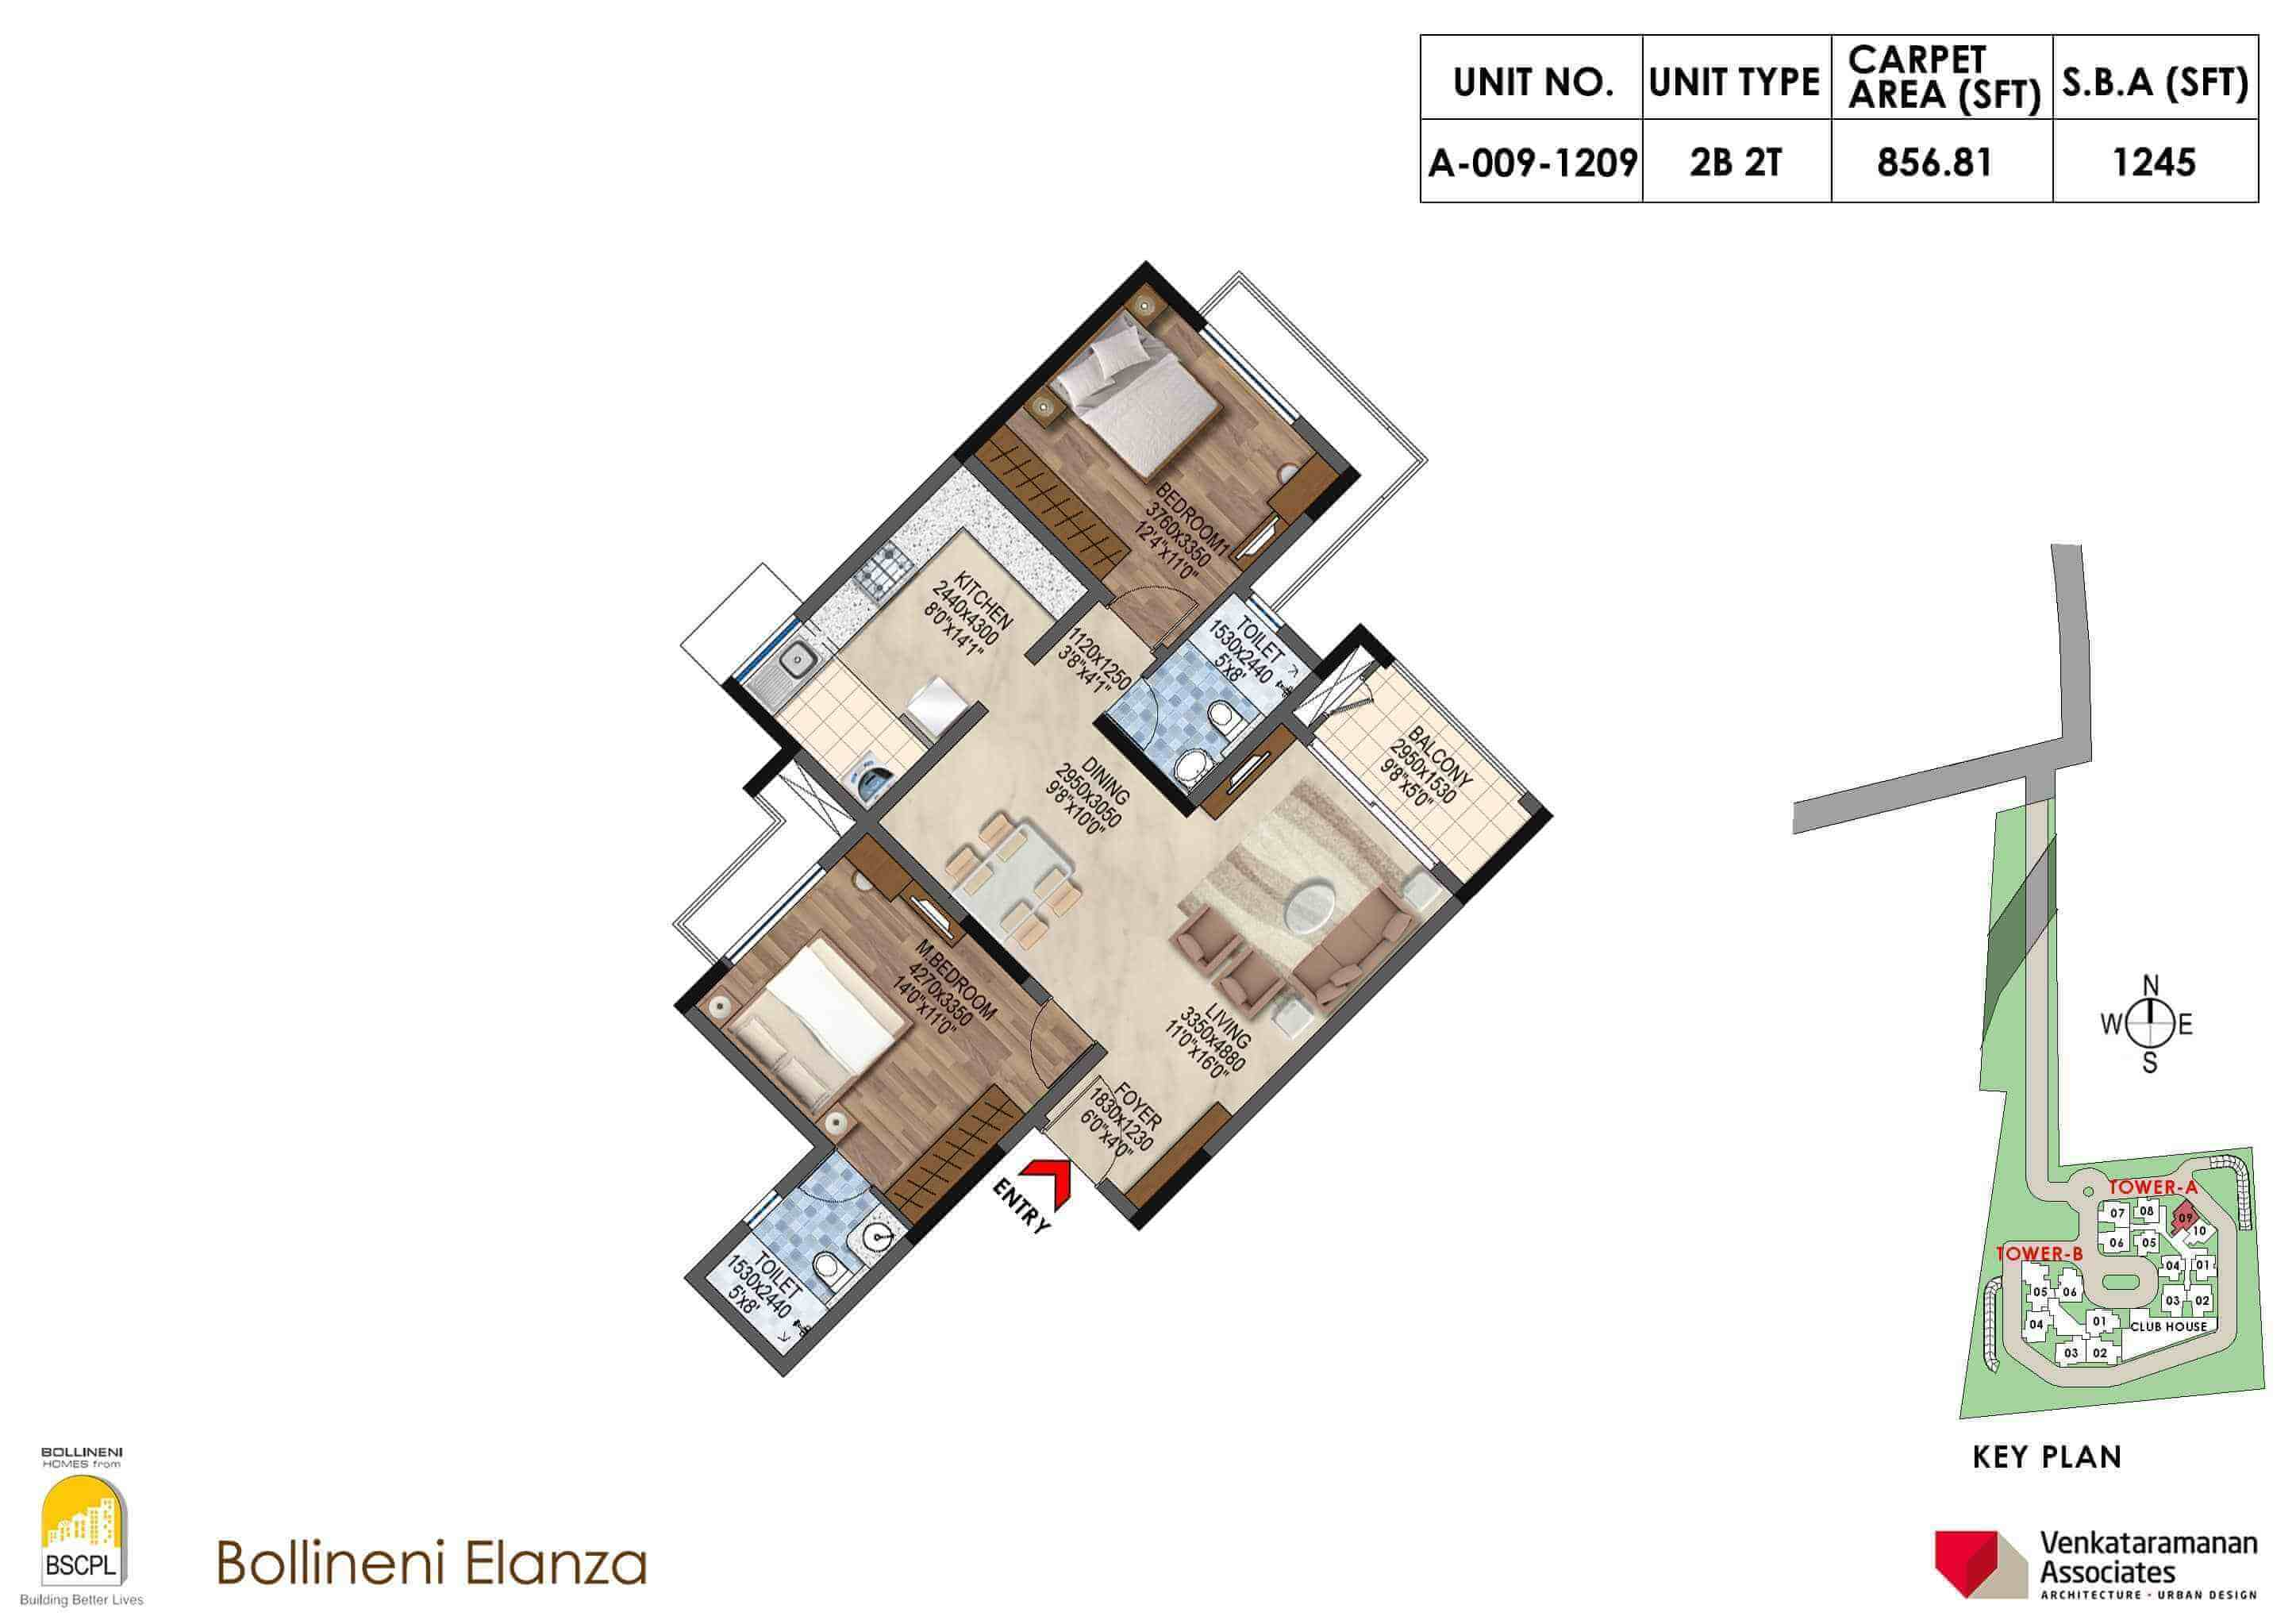 bscpl bollineni elanza apartment 2bhk 1245sqft 1